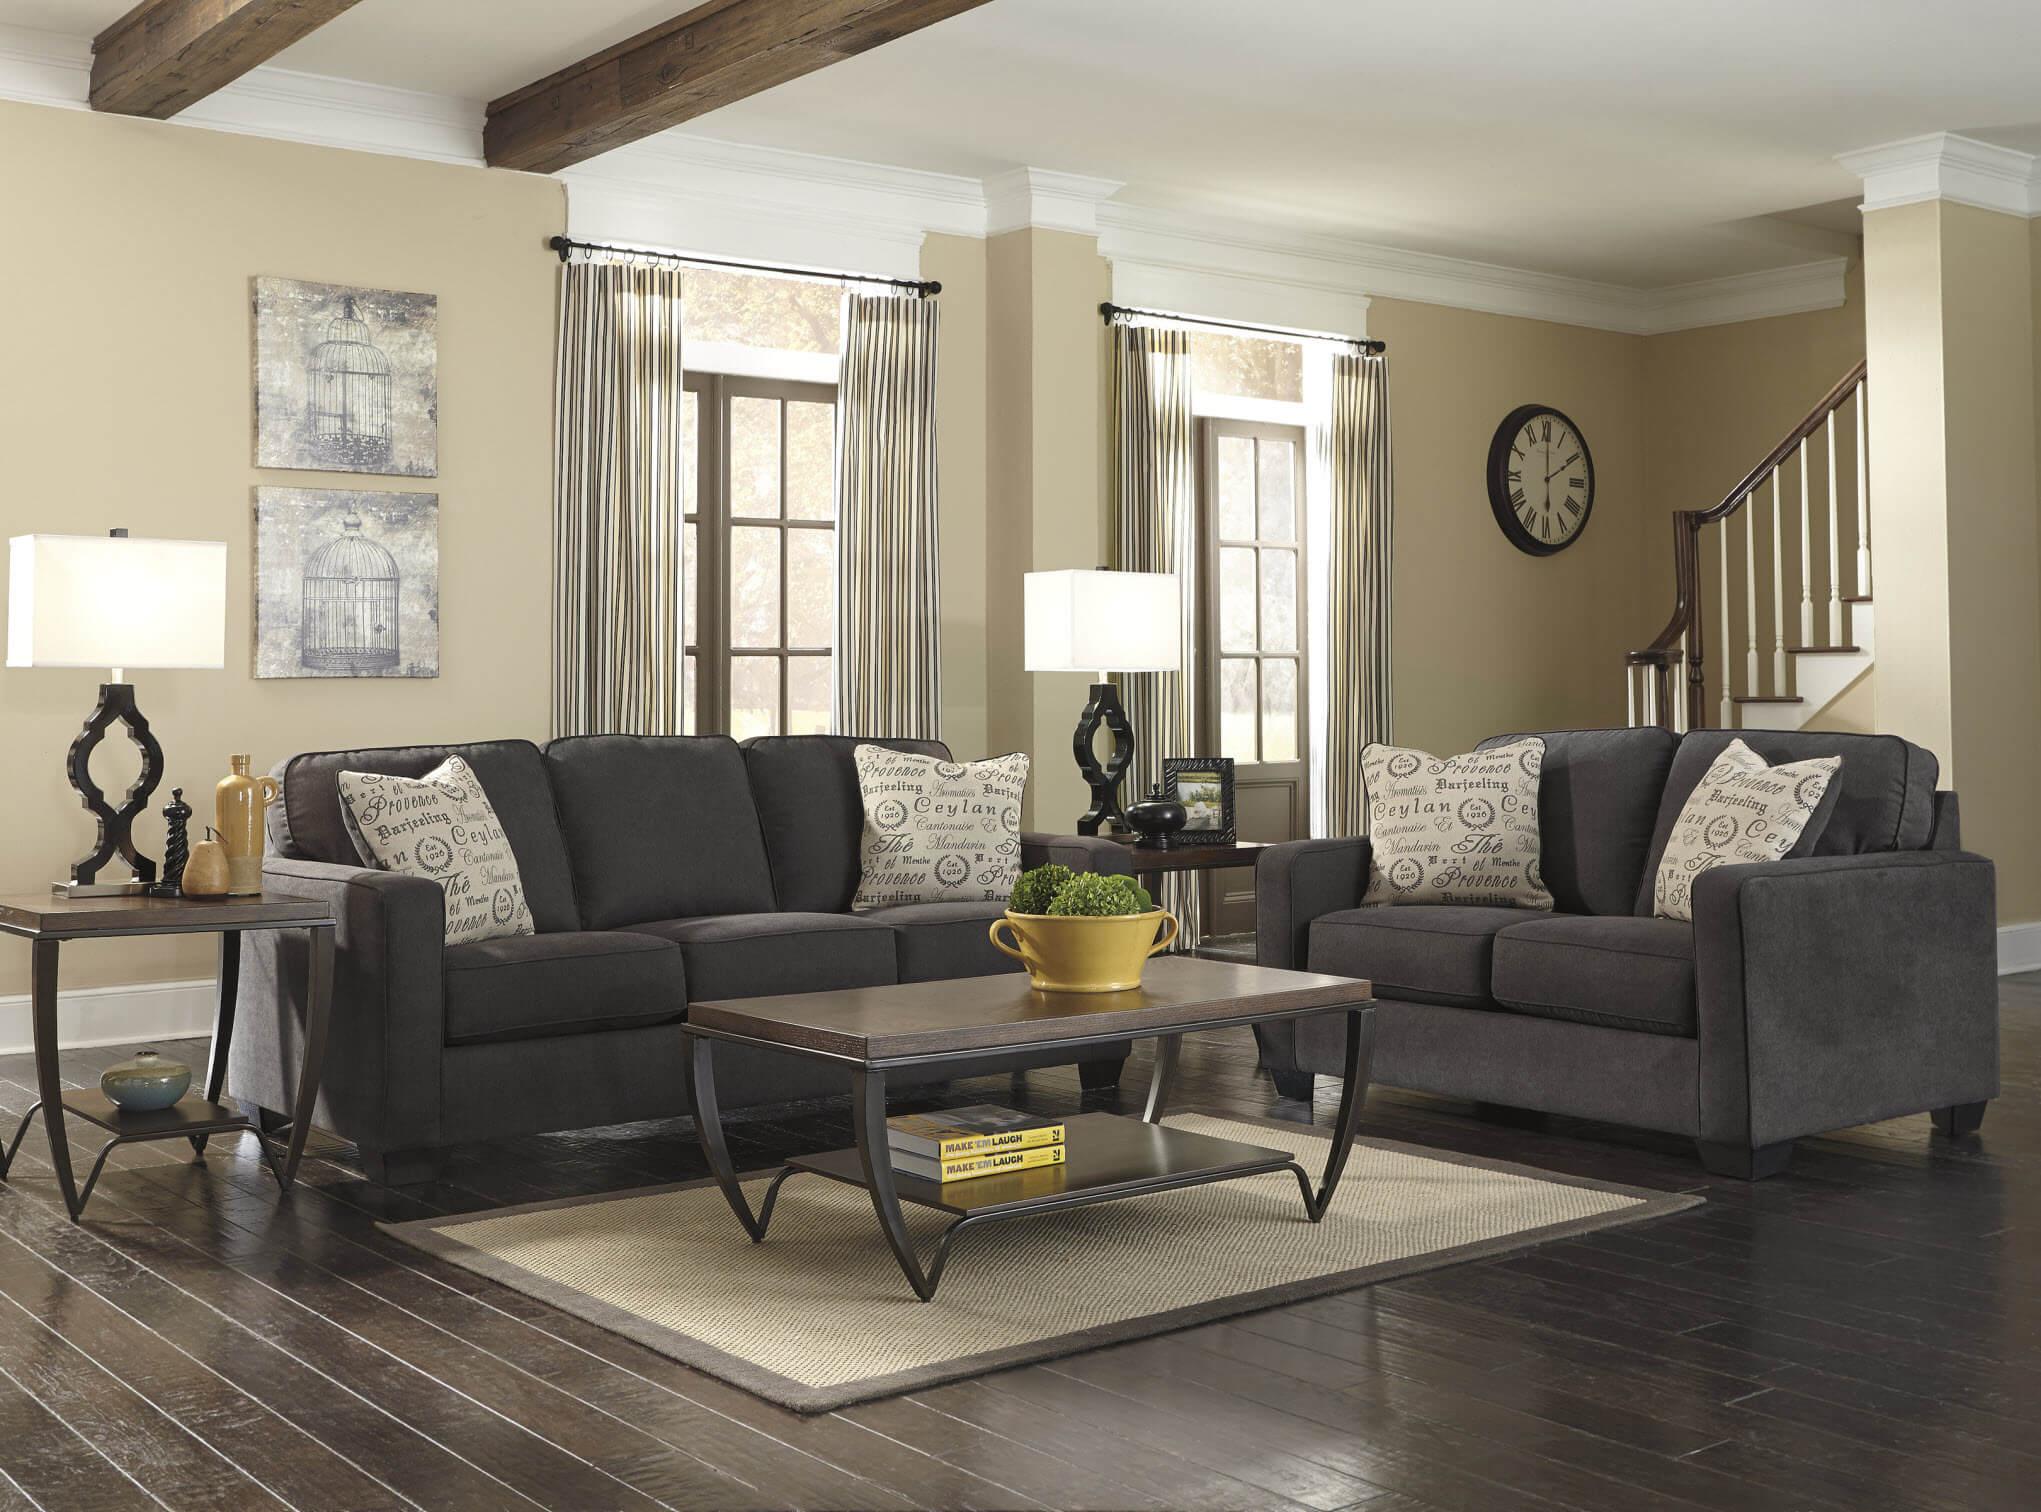 Charcoal Sofa Set Hugo 3 2 Seater Ter Charcoal Fabric